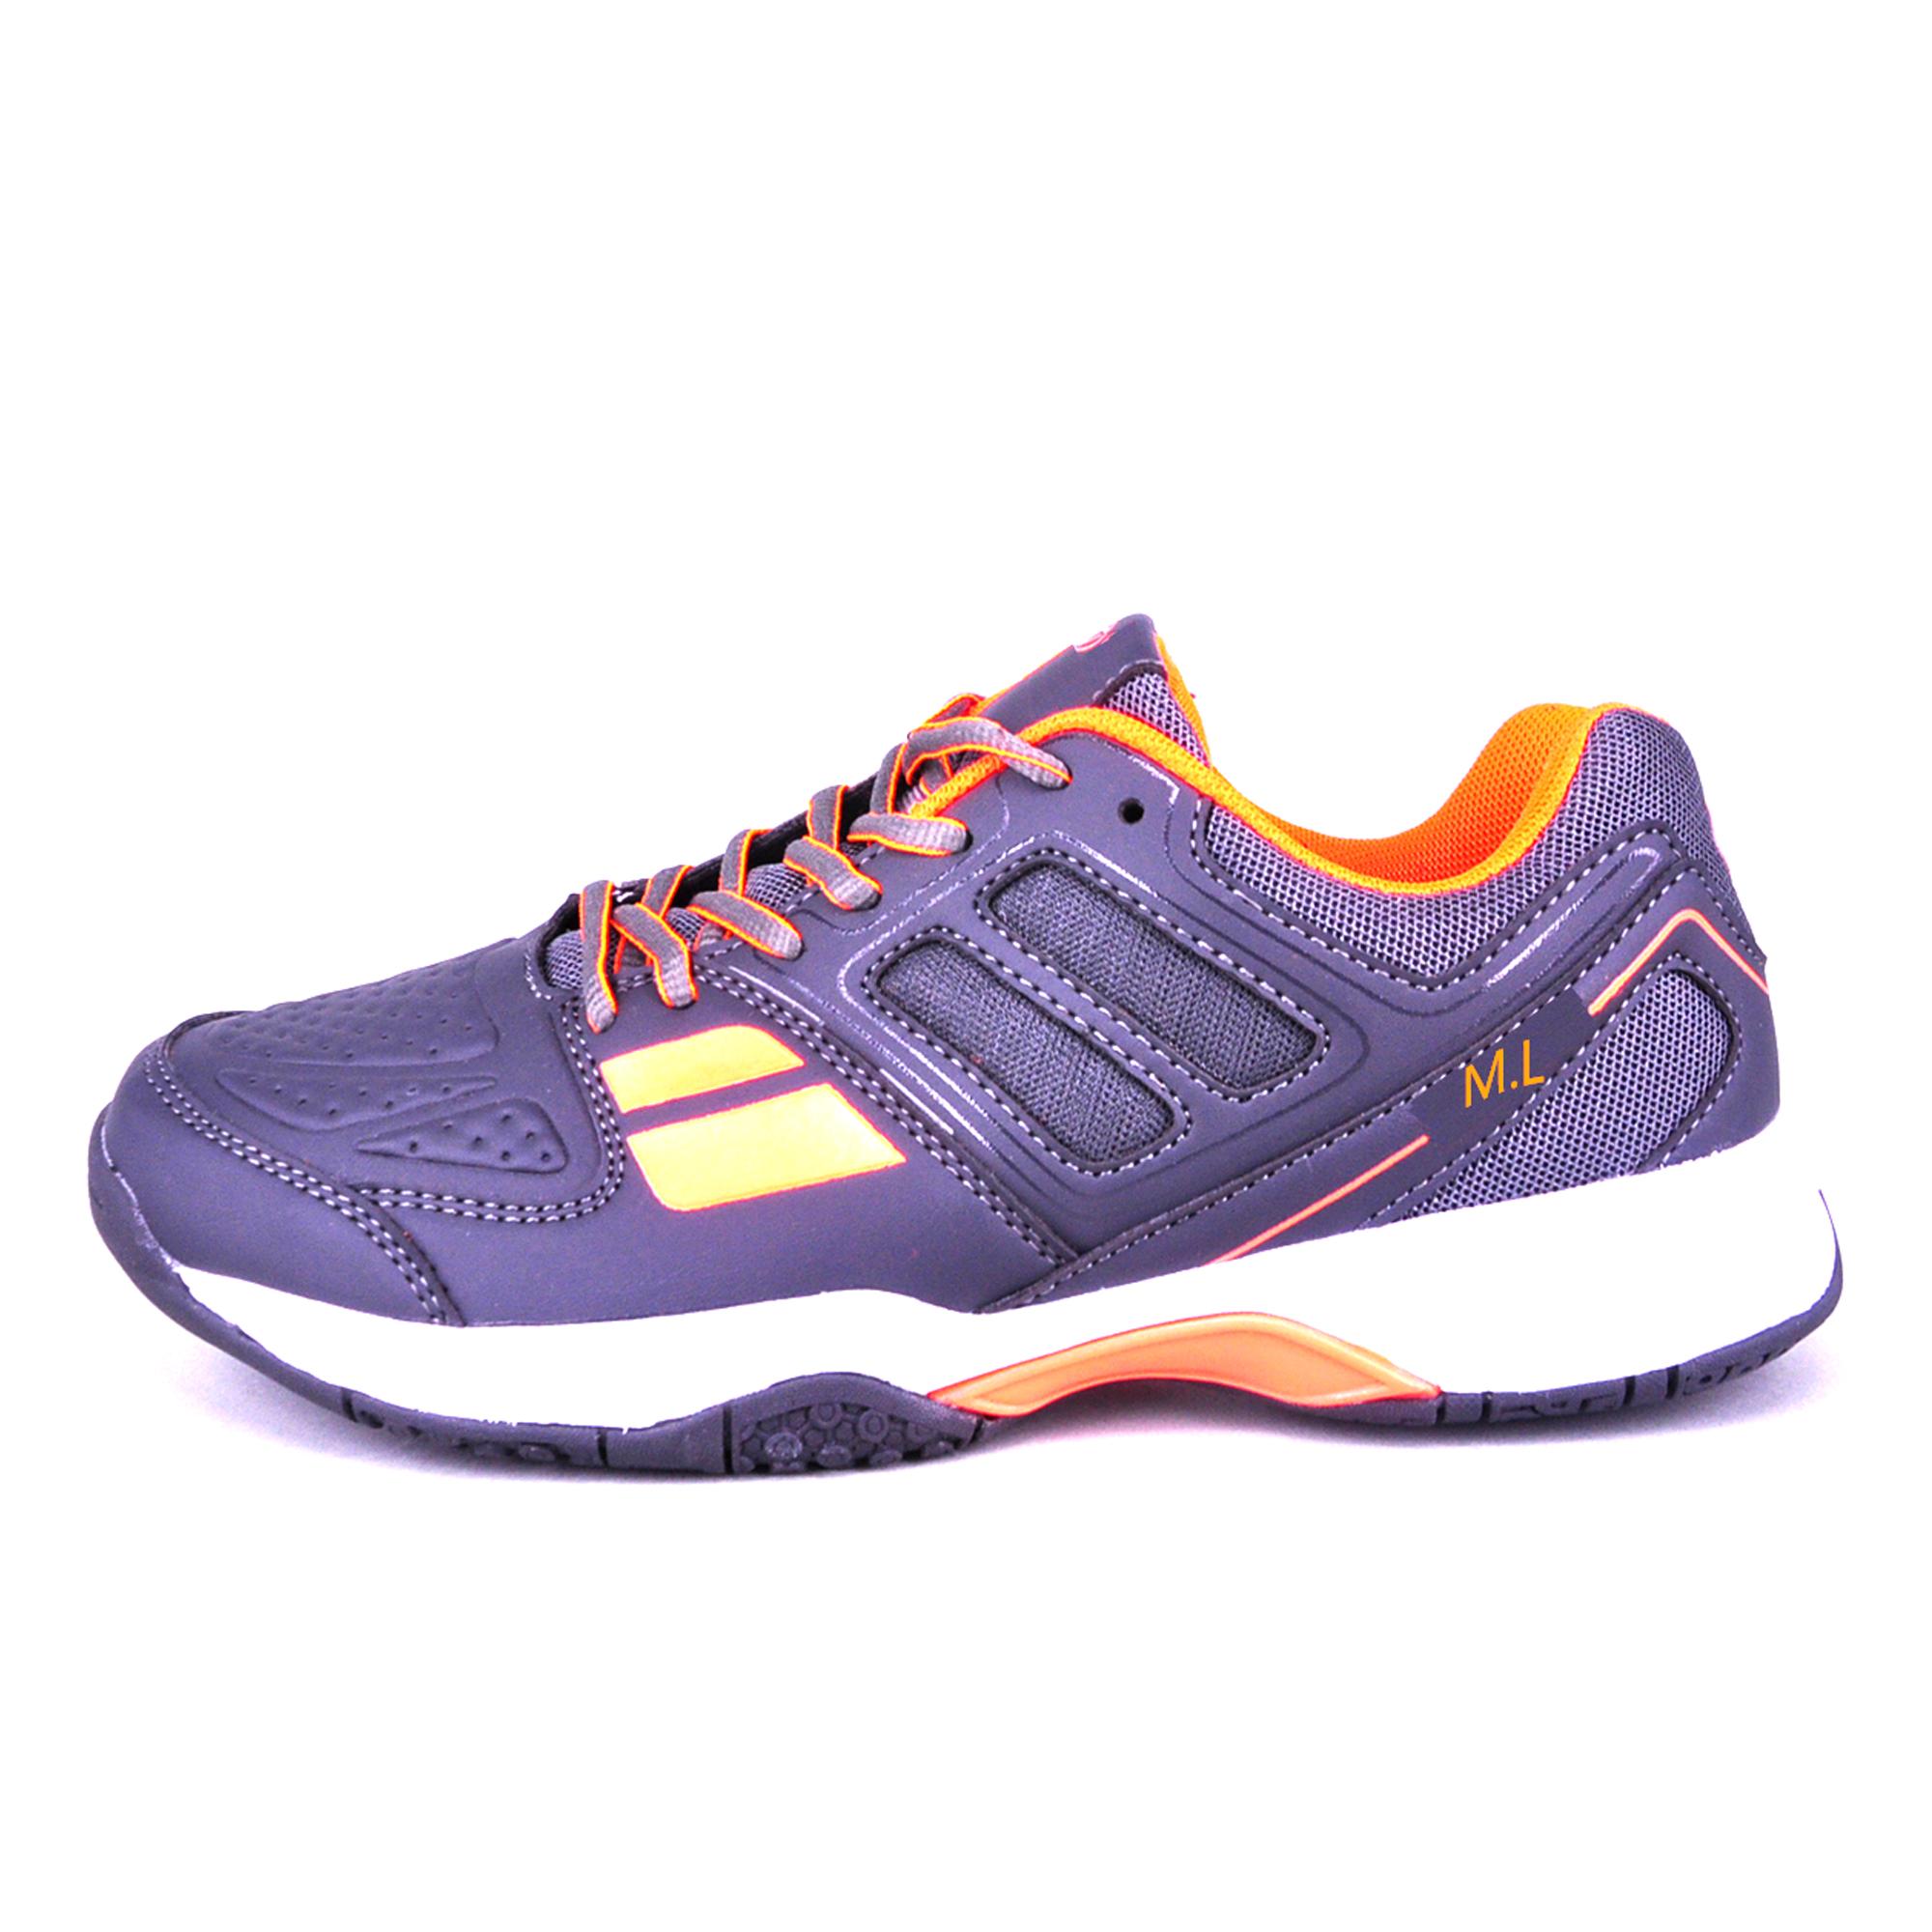 popular tennis shoes